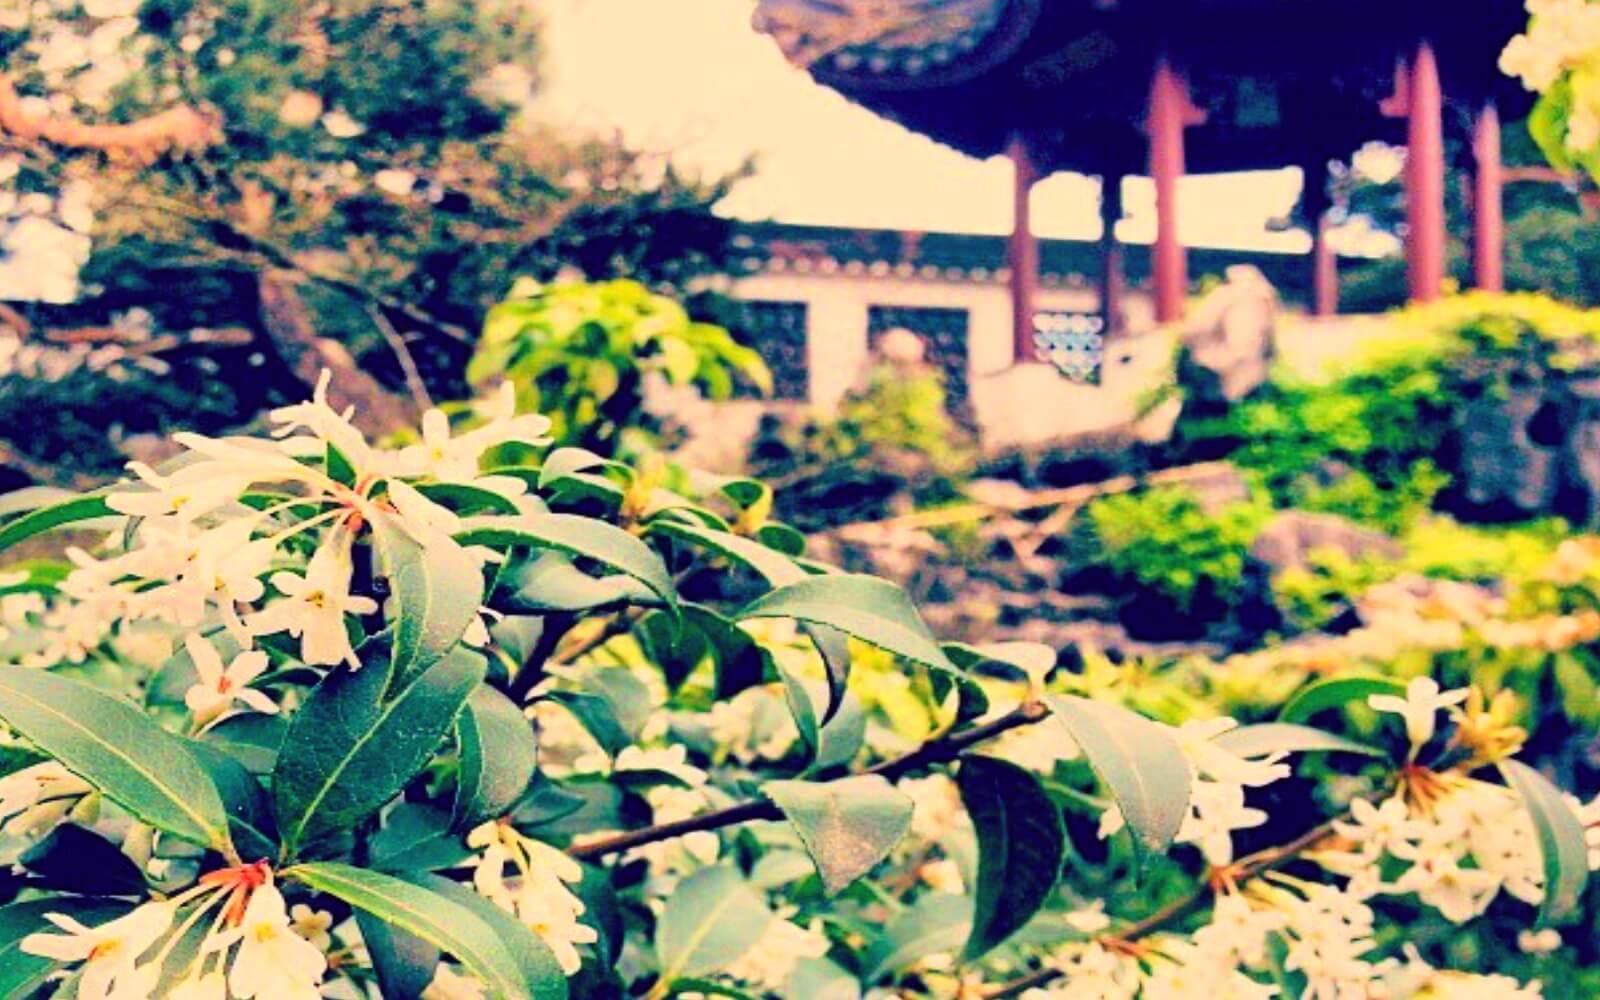 Plants at the sun Yat-Sen Classical Garden